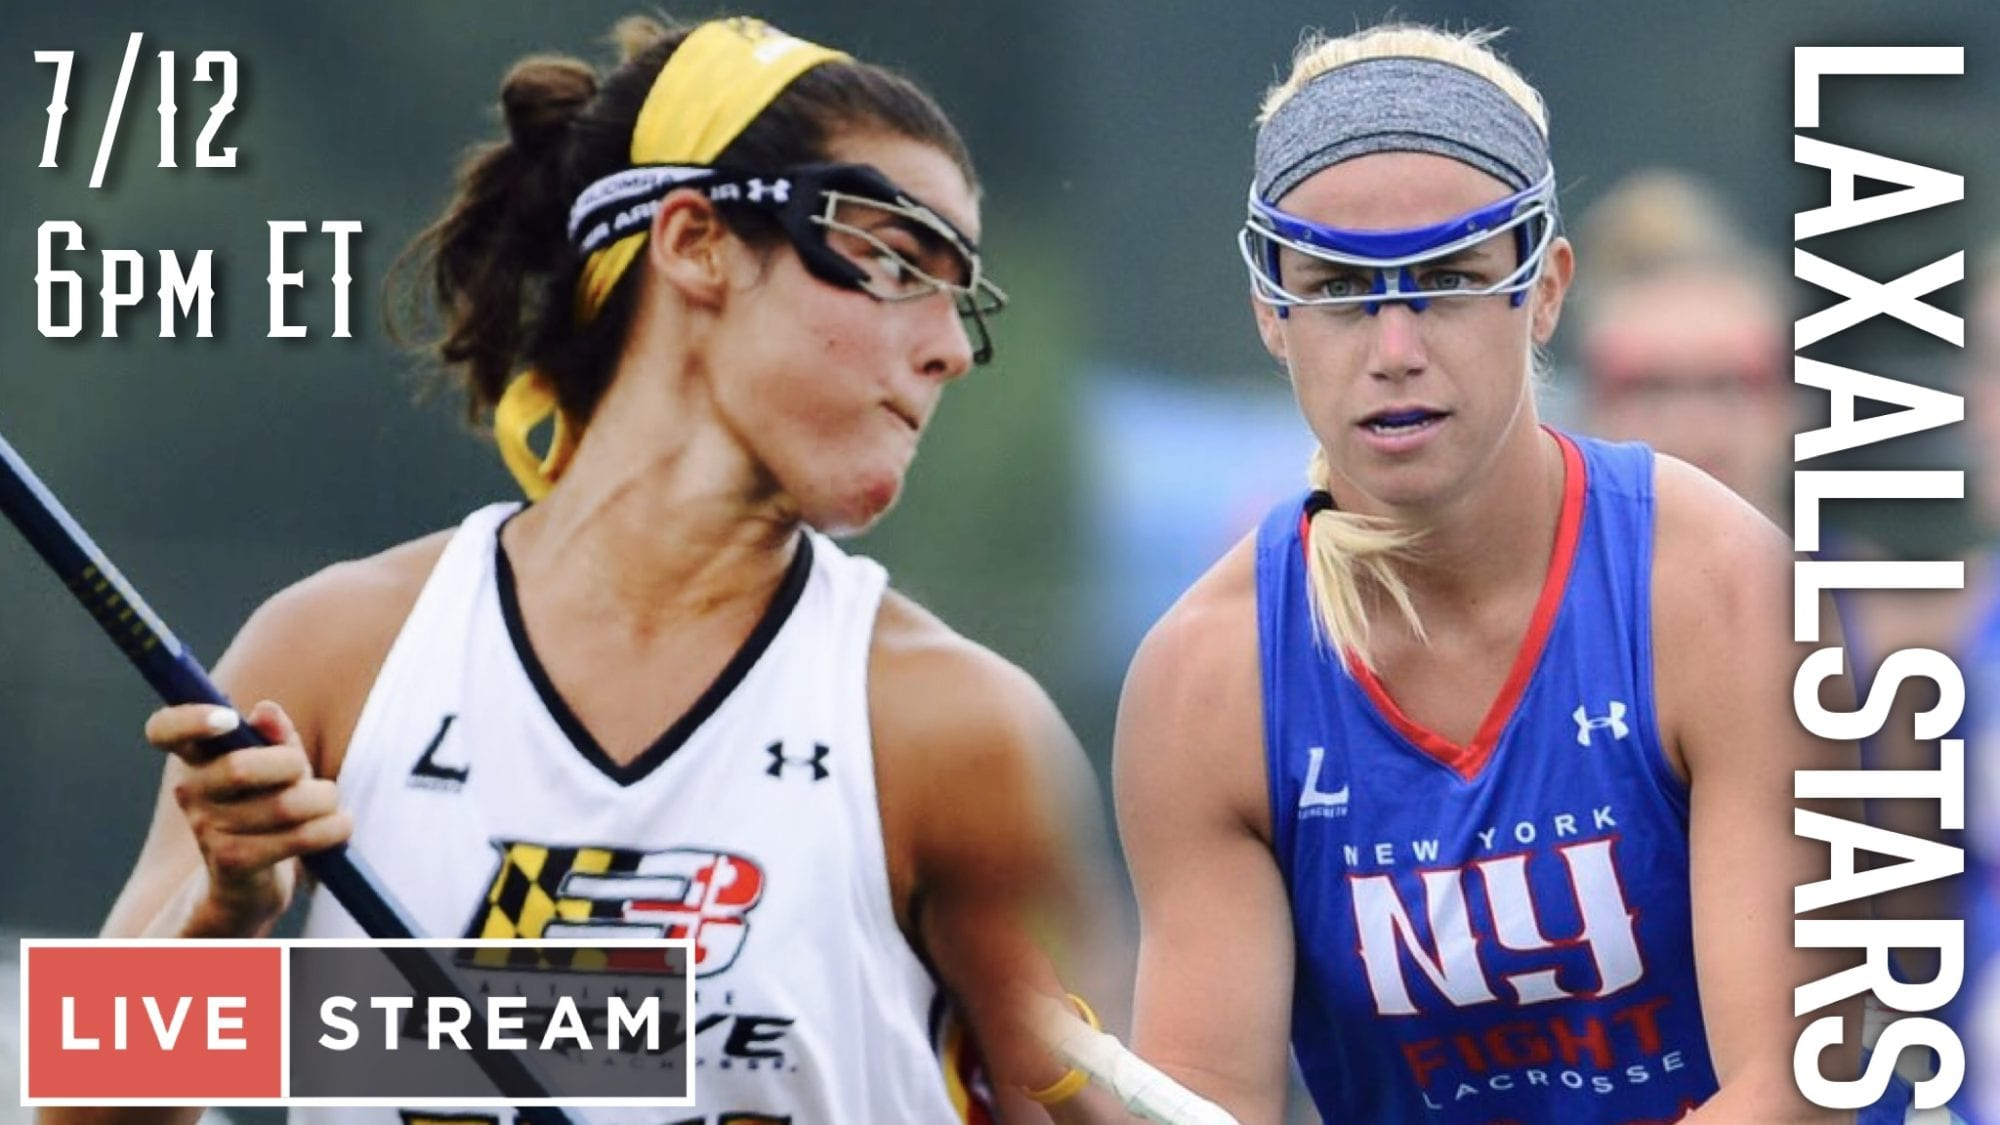 Baltimore Brave Vs New York Fight : Women's Pro Lacrosse Semifinal